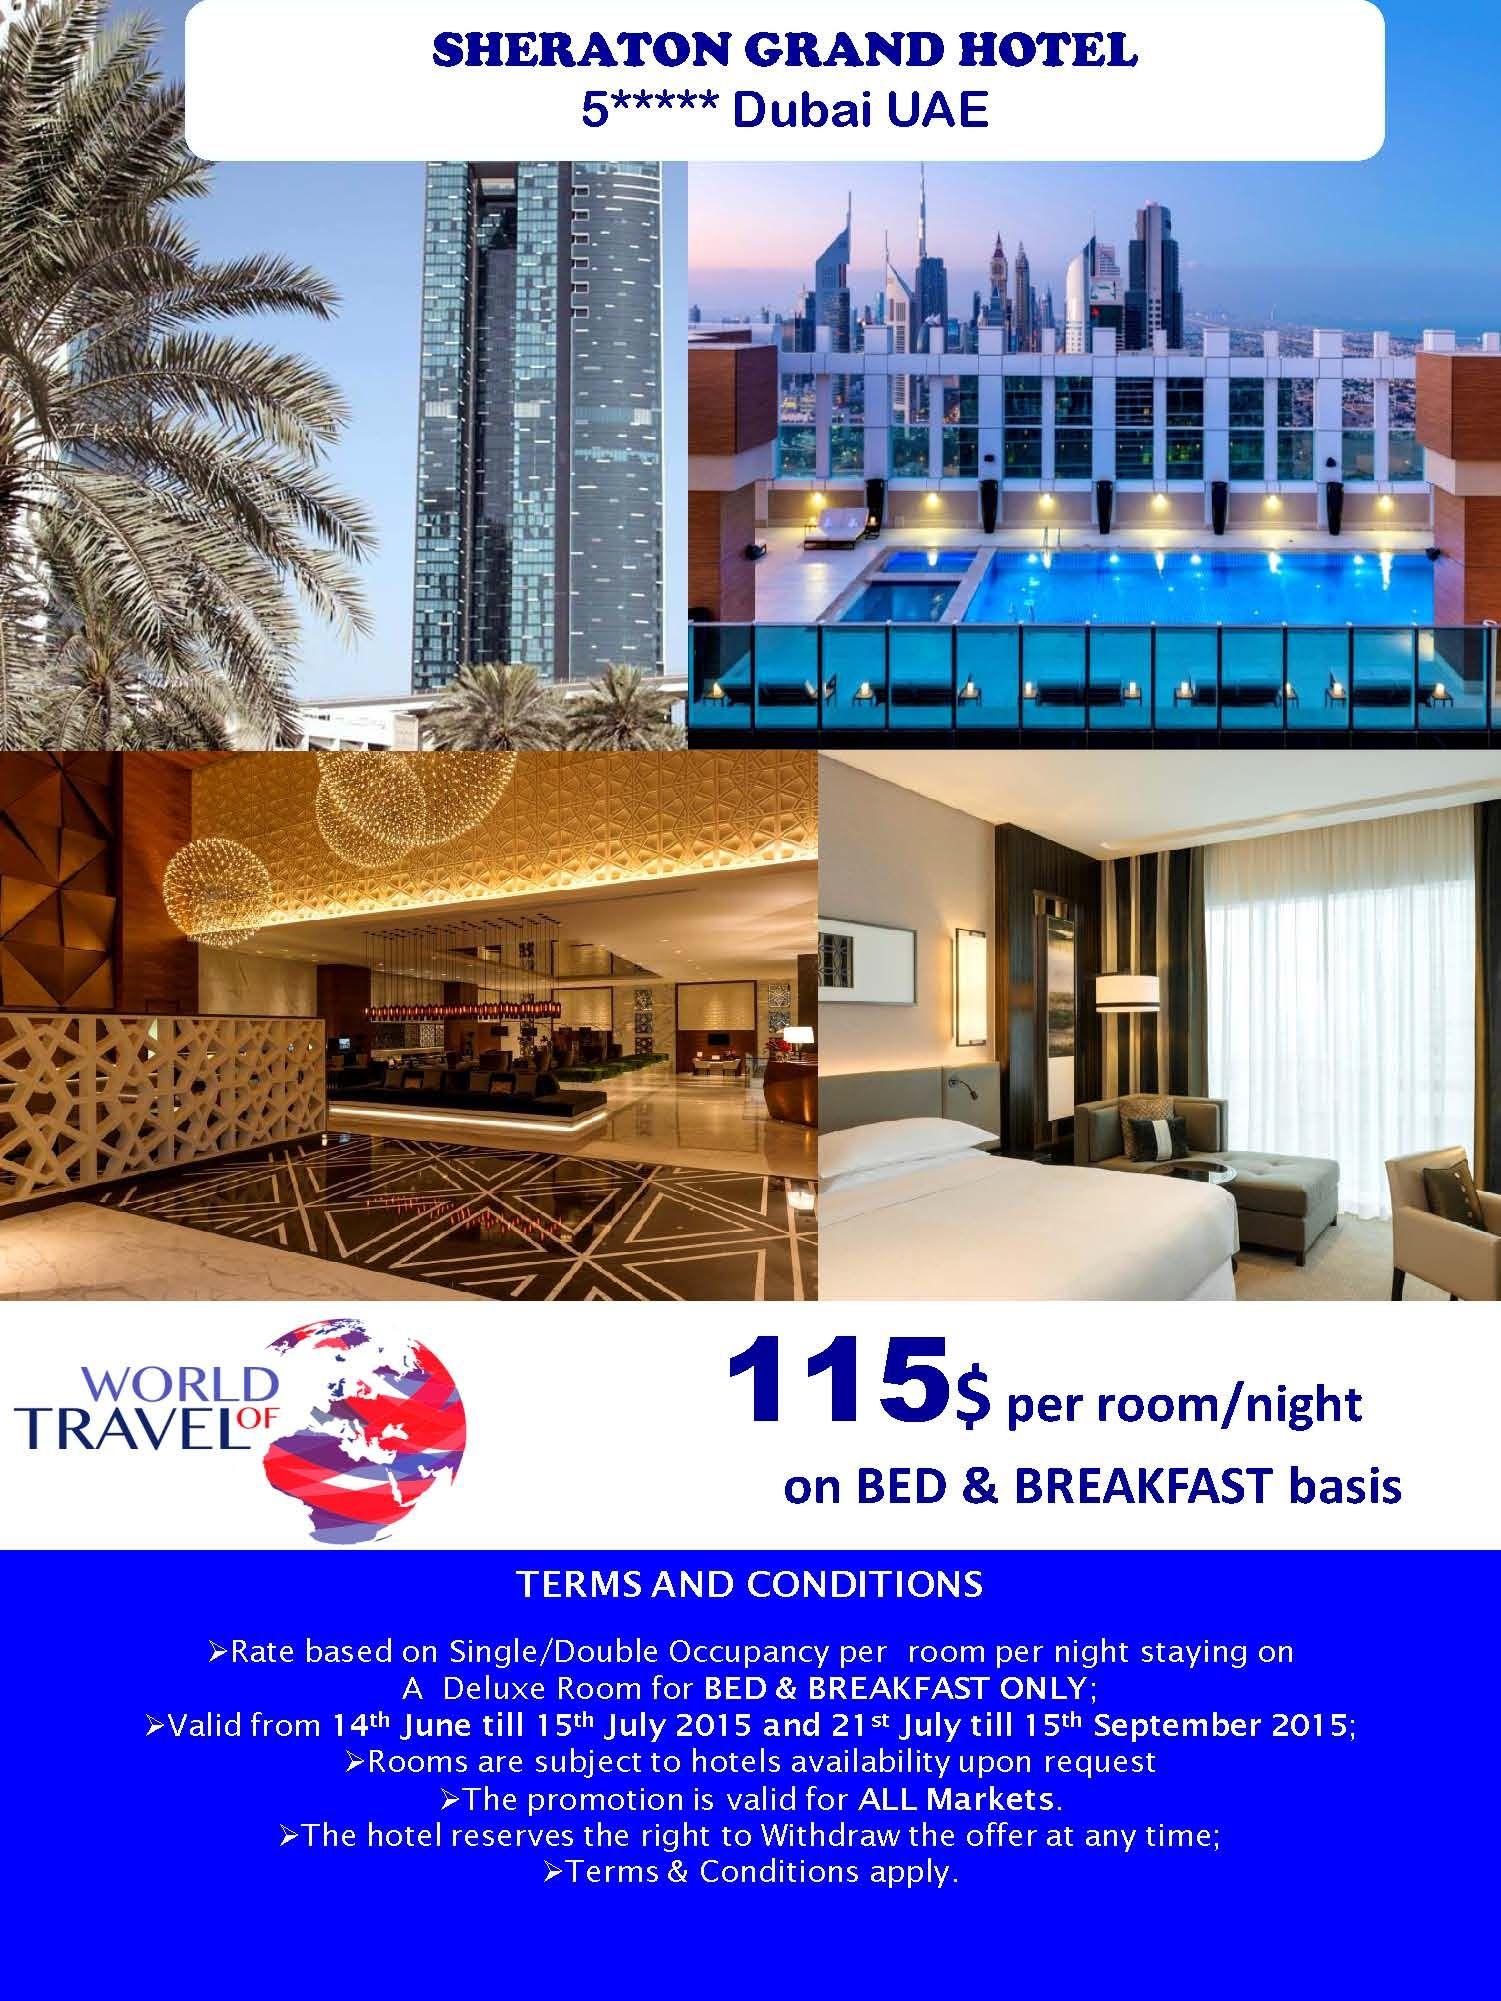 Mydubai Summerholidays Sheraton Luxurylife Dubai Uae Hotel Specials Grand Hotel Hotel